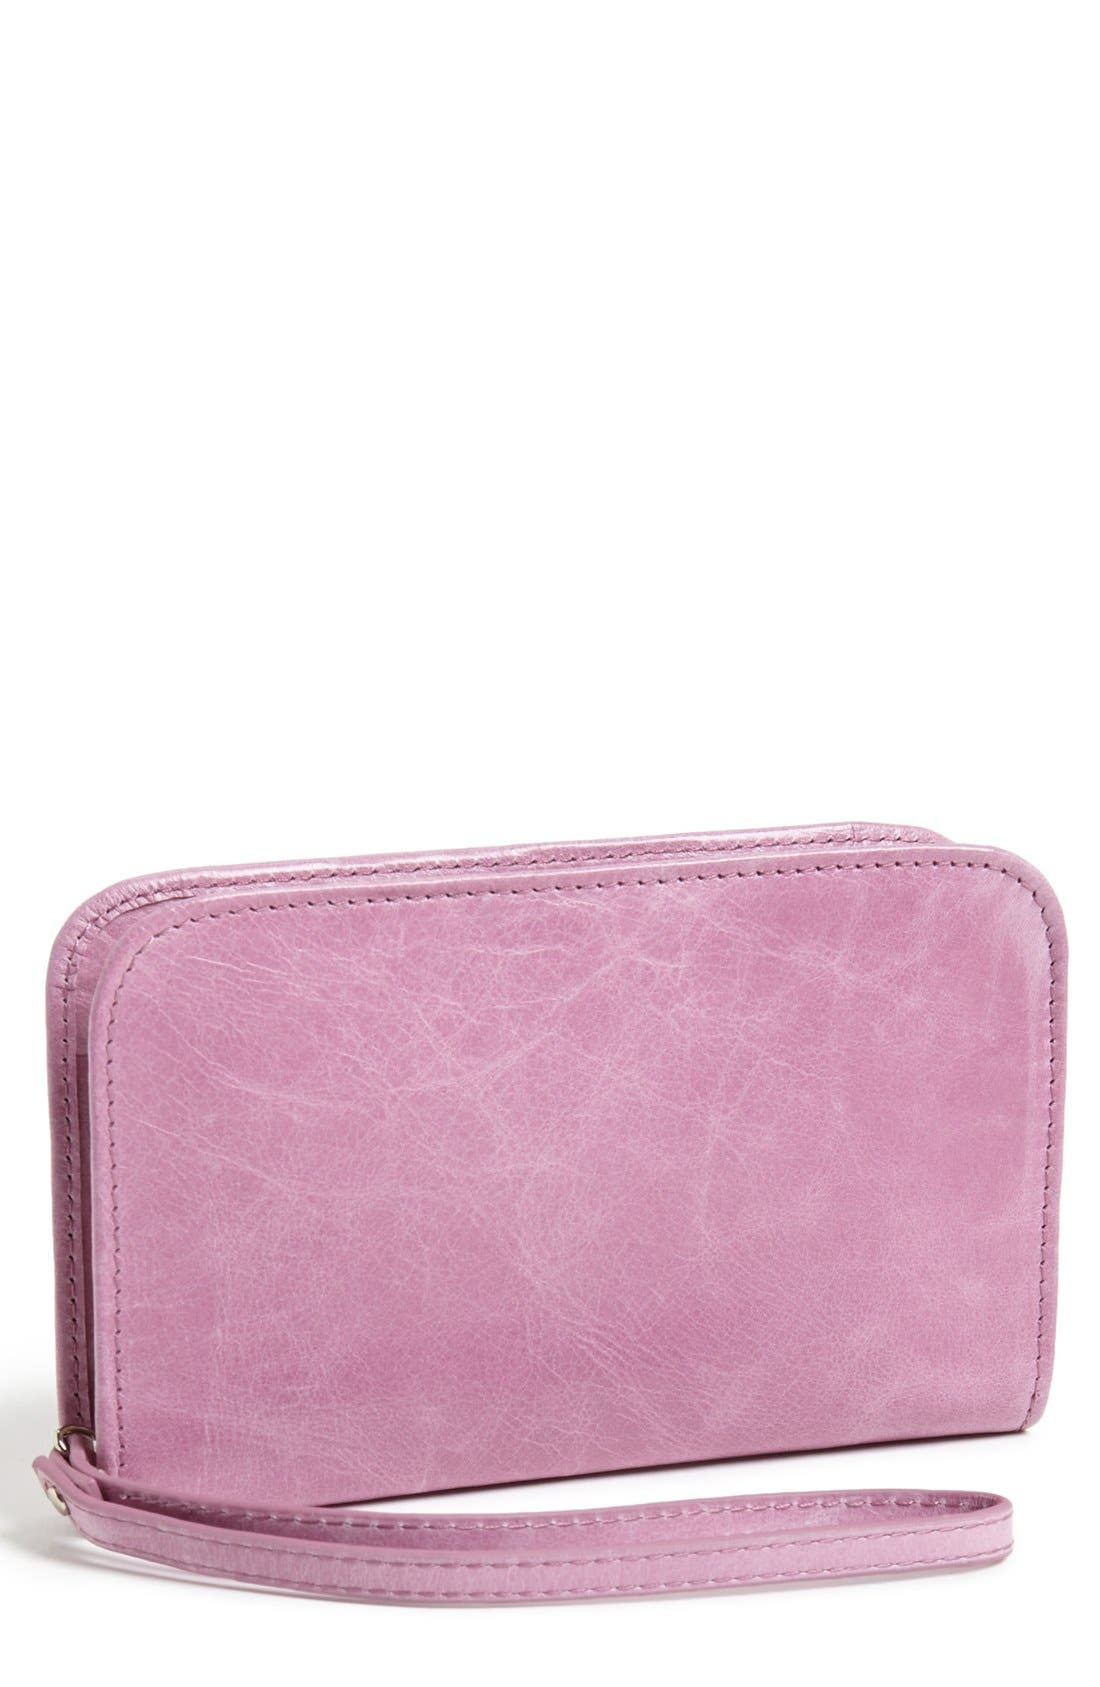 Main Image - Hobo 'Jess' Phone Wallet